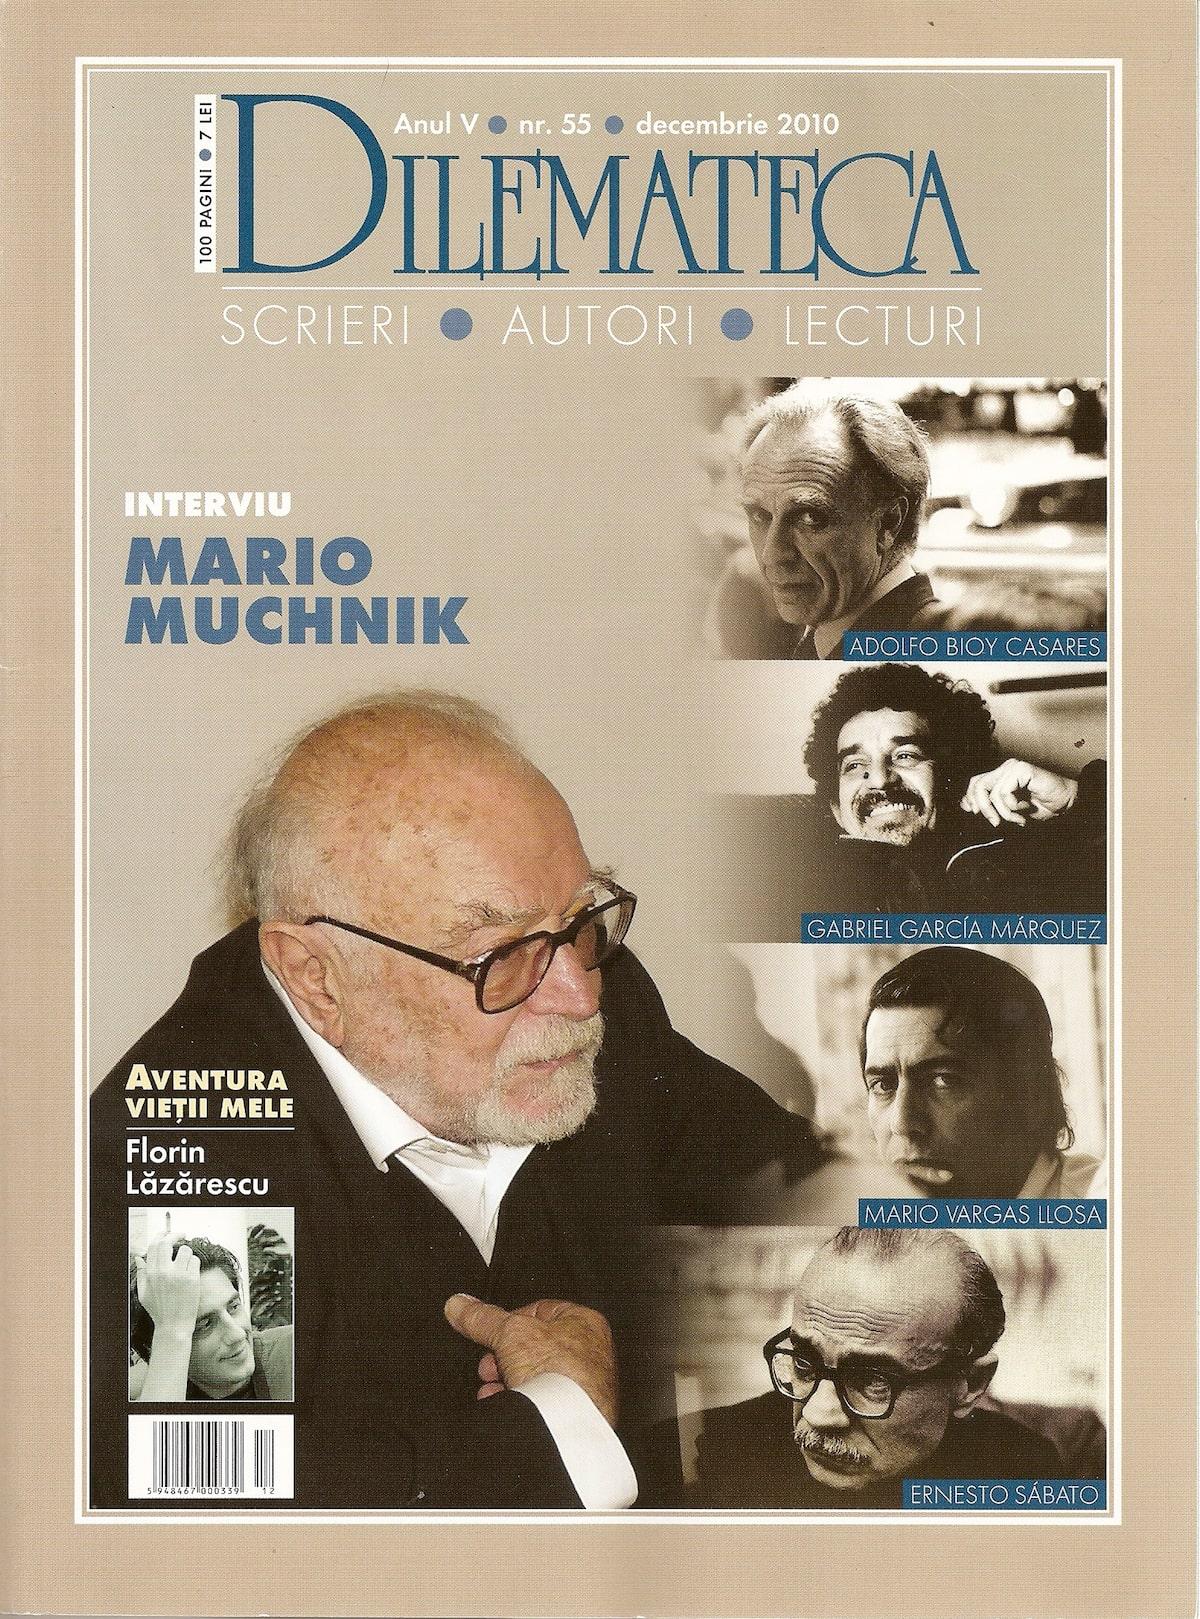 Dilemateca n°55 dec.2010, couv